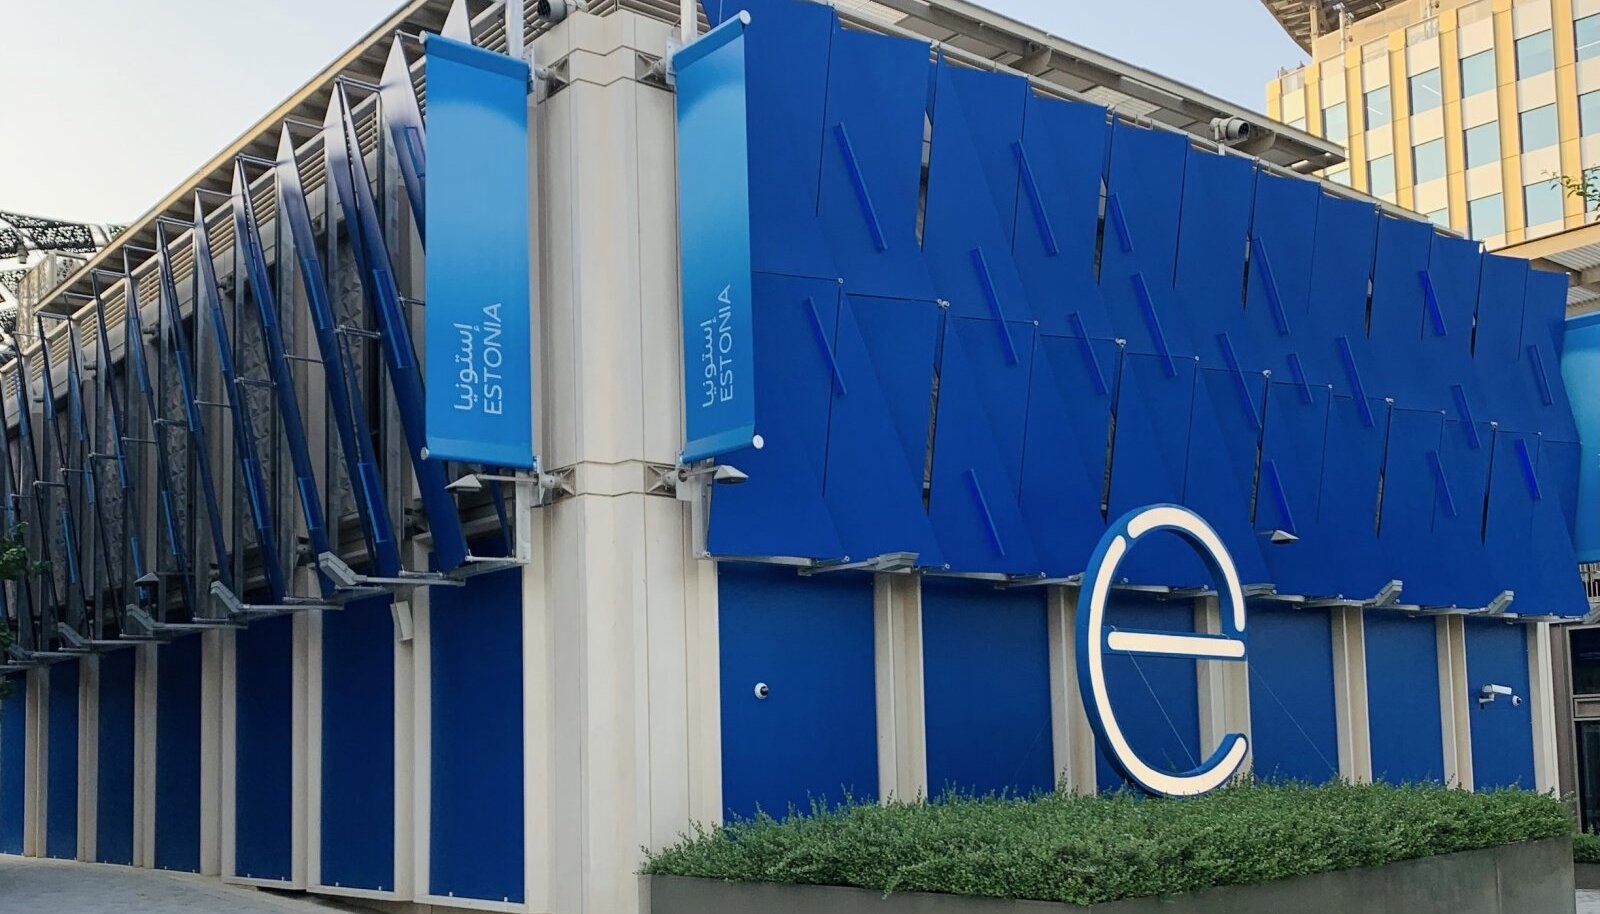 e-Eesti paviljon